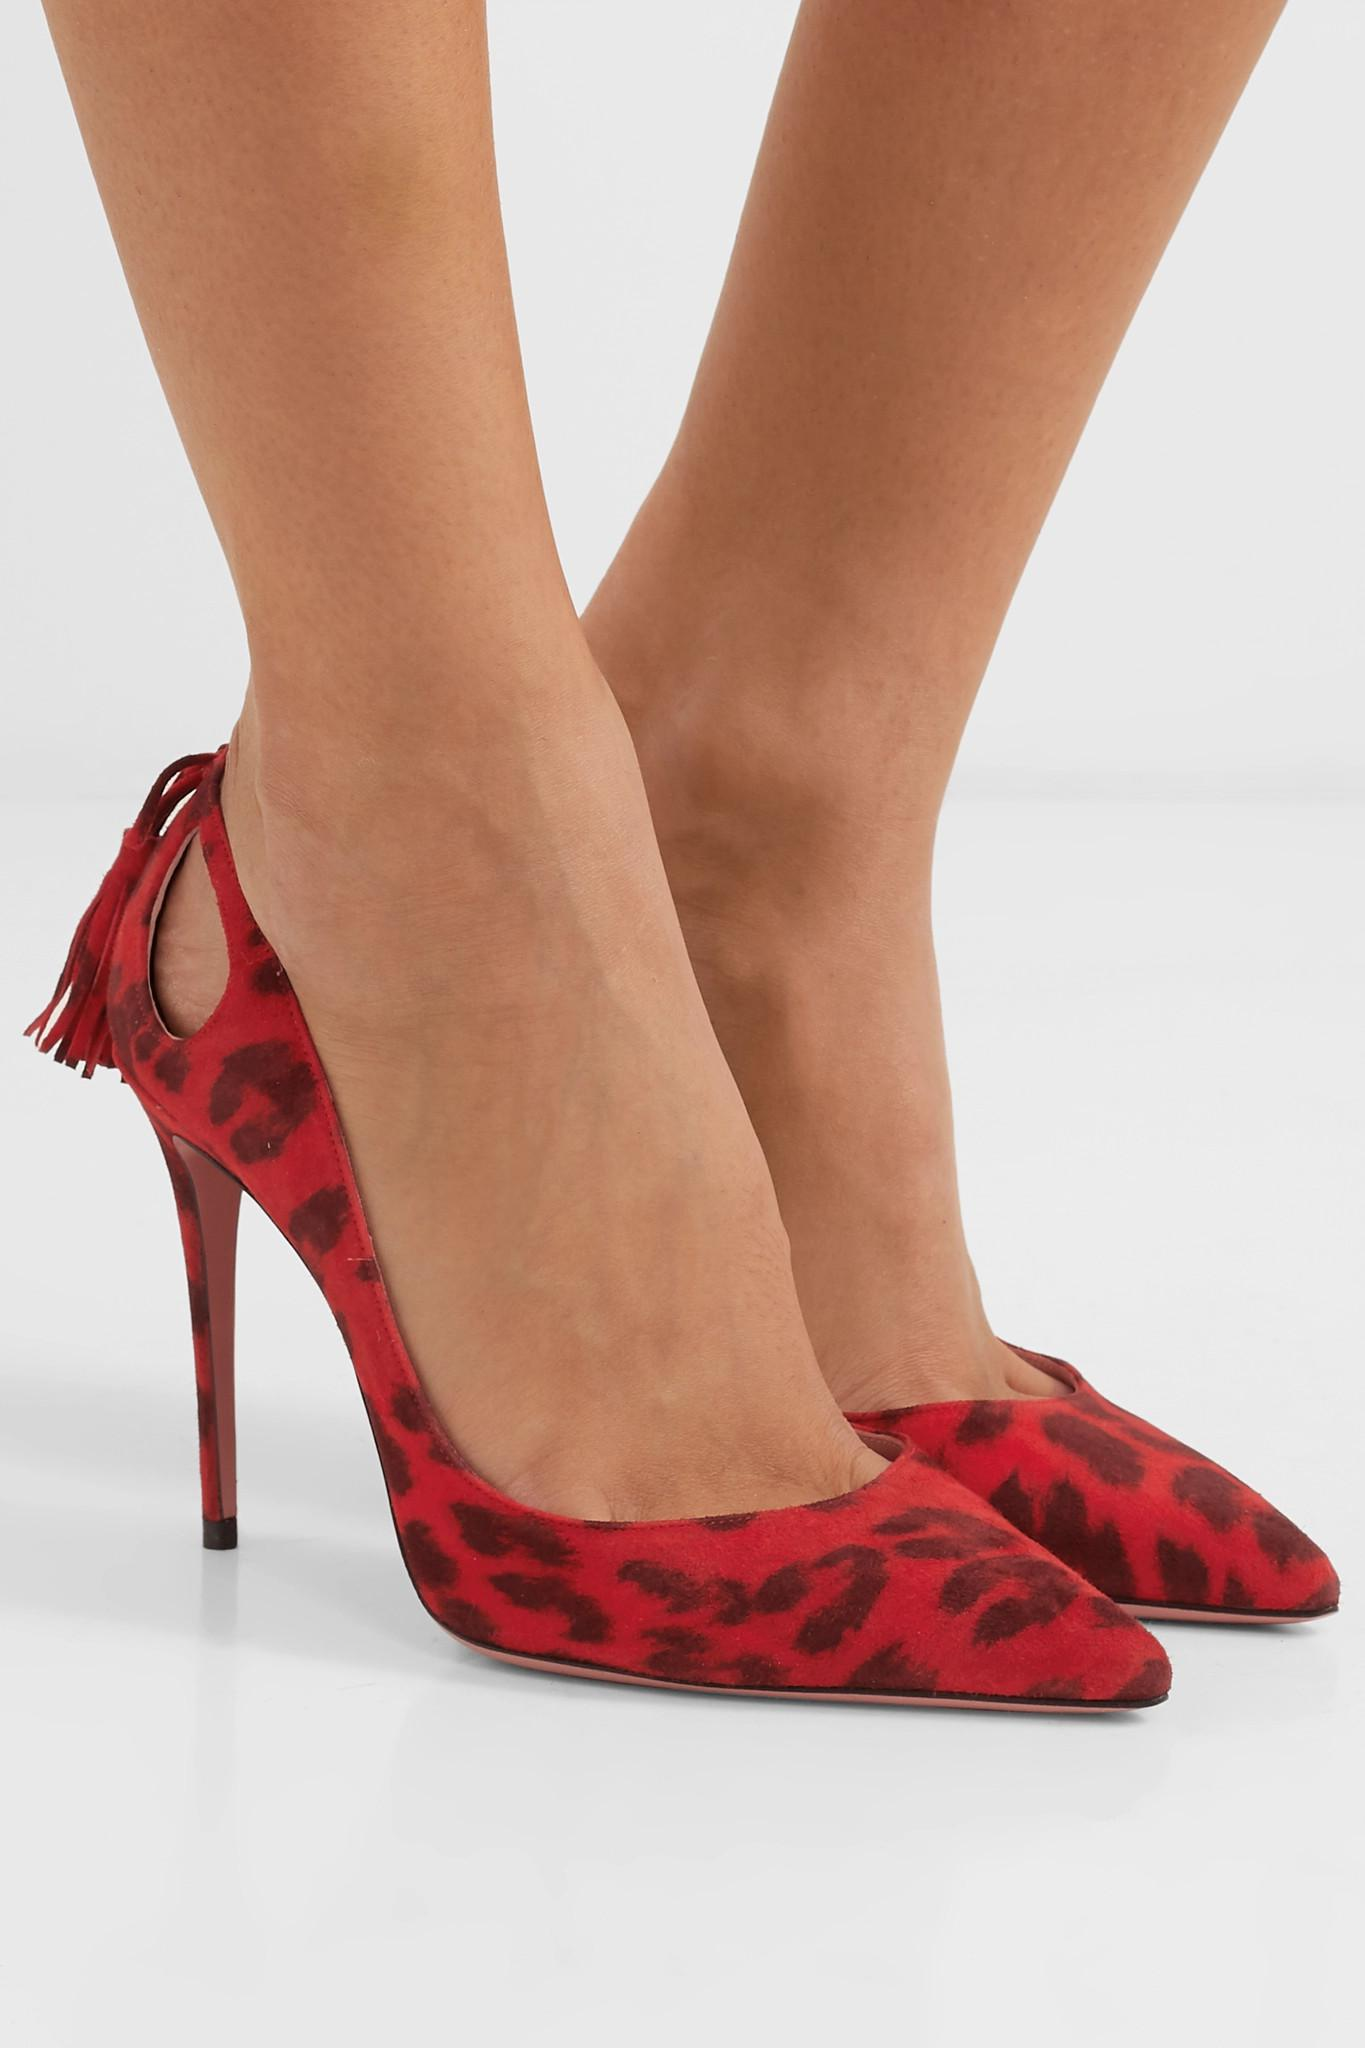 1744a0d1d044 Aquazzura - Red Forever Marilyn 105 Leopard-print Cutout Tasseled Suede  Pumps - Lyst. View fullscreen